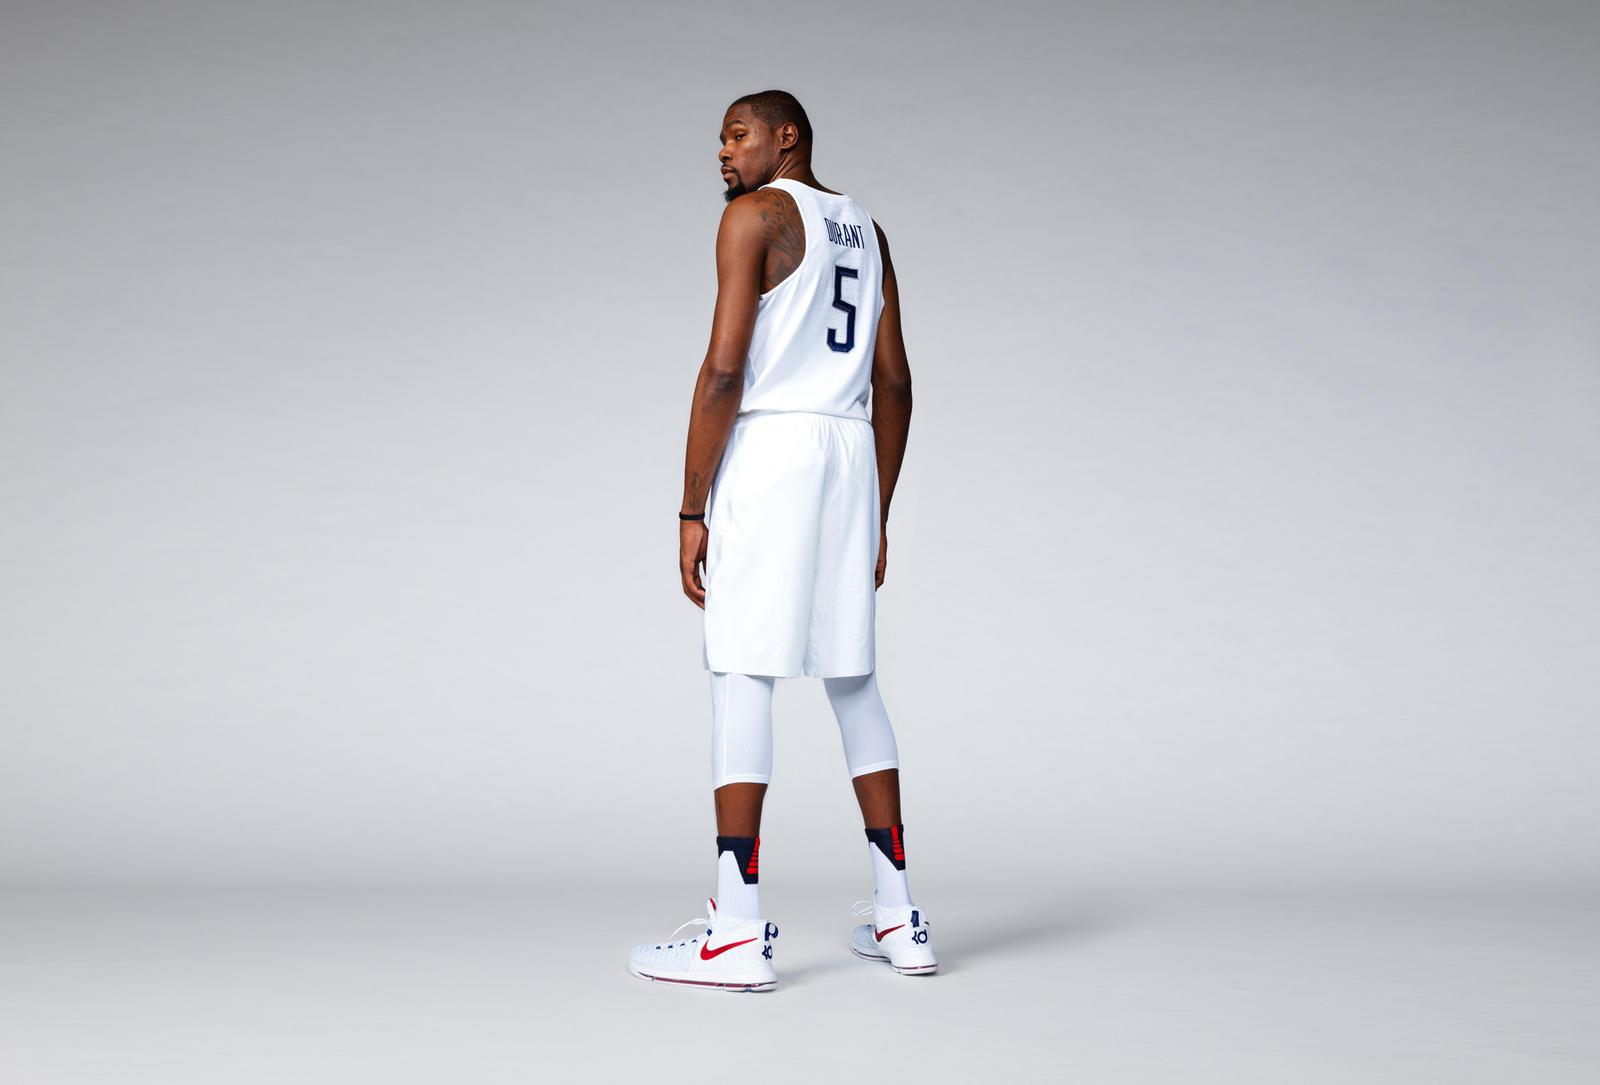 Kevin durant uniform shorts